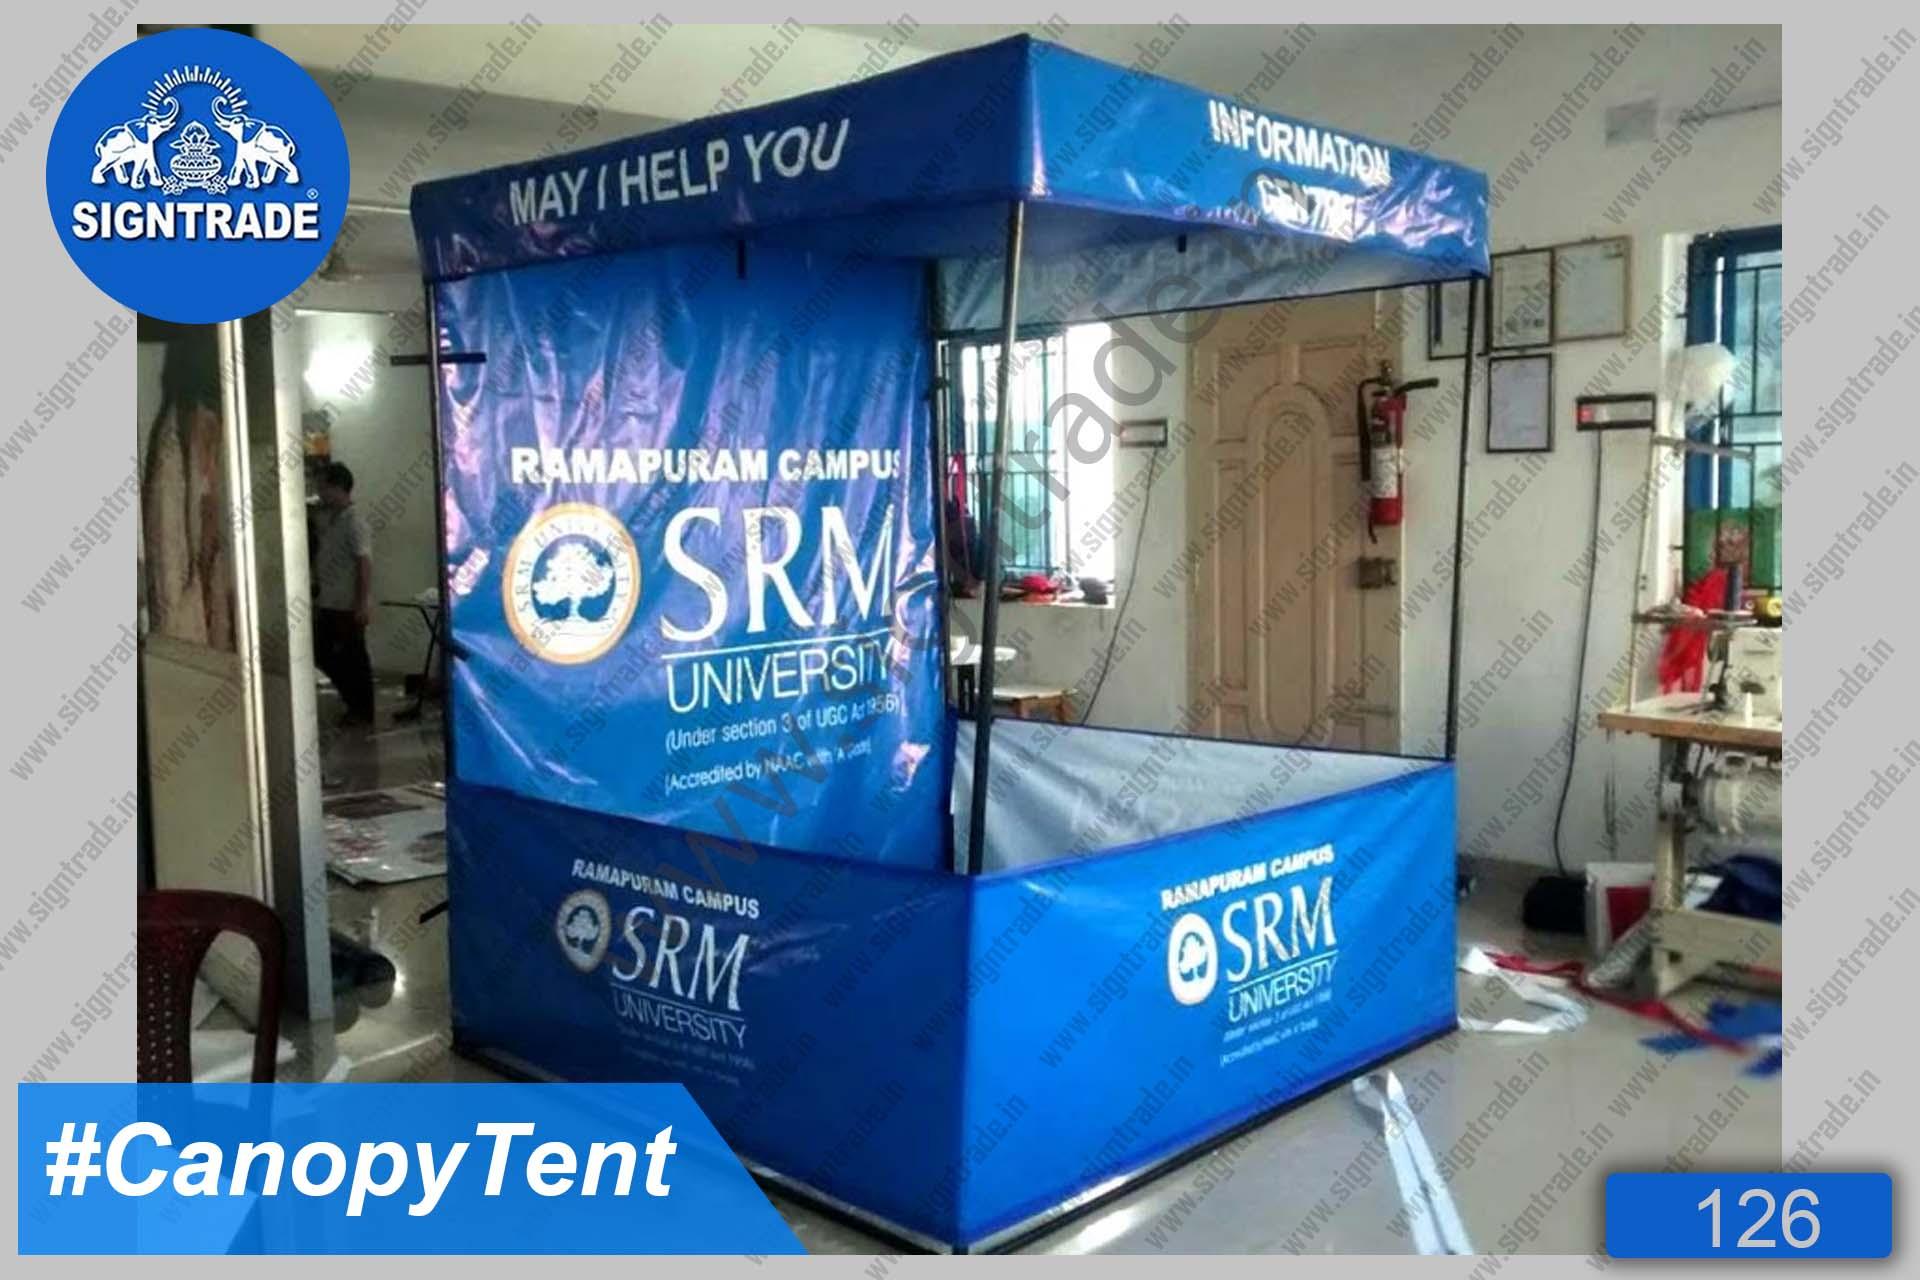 SRM Canopy Tent